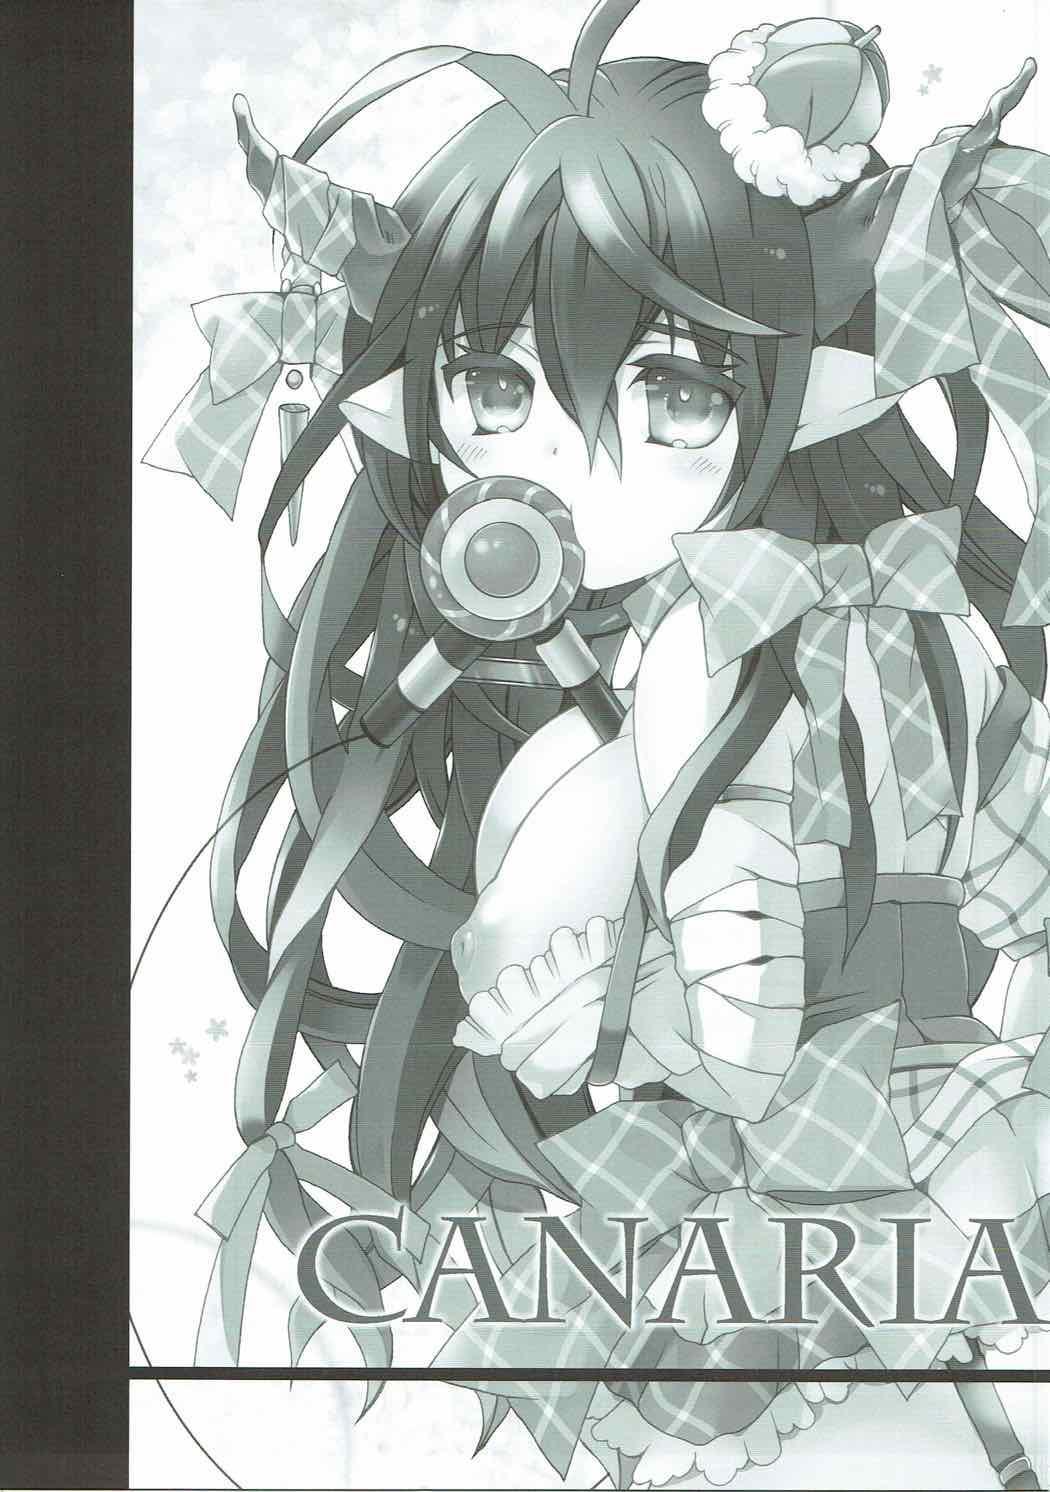 CANARIA 1